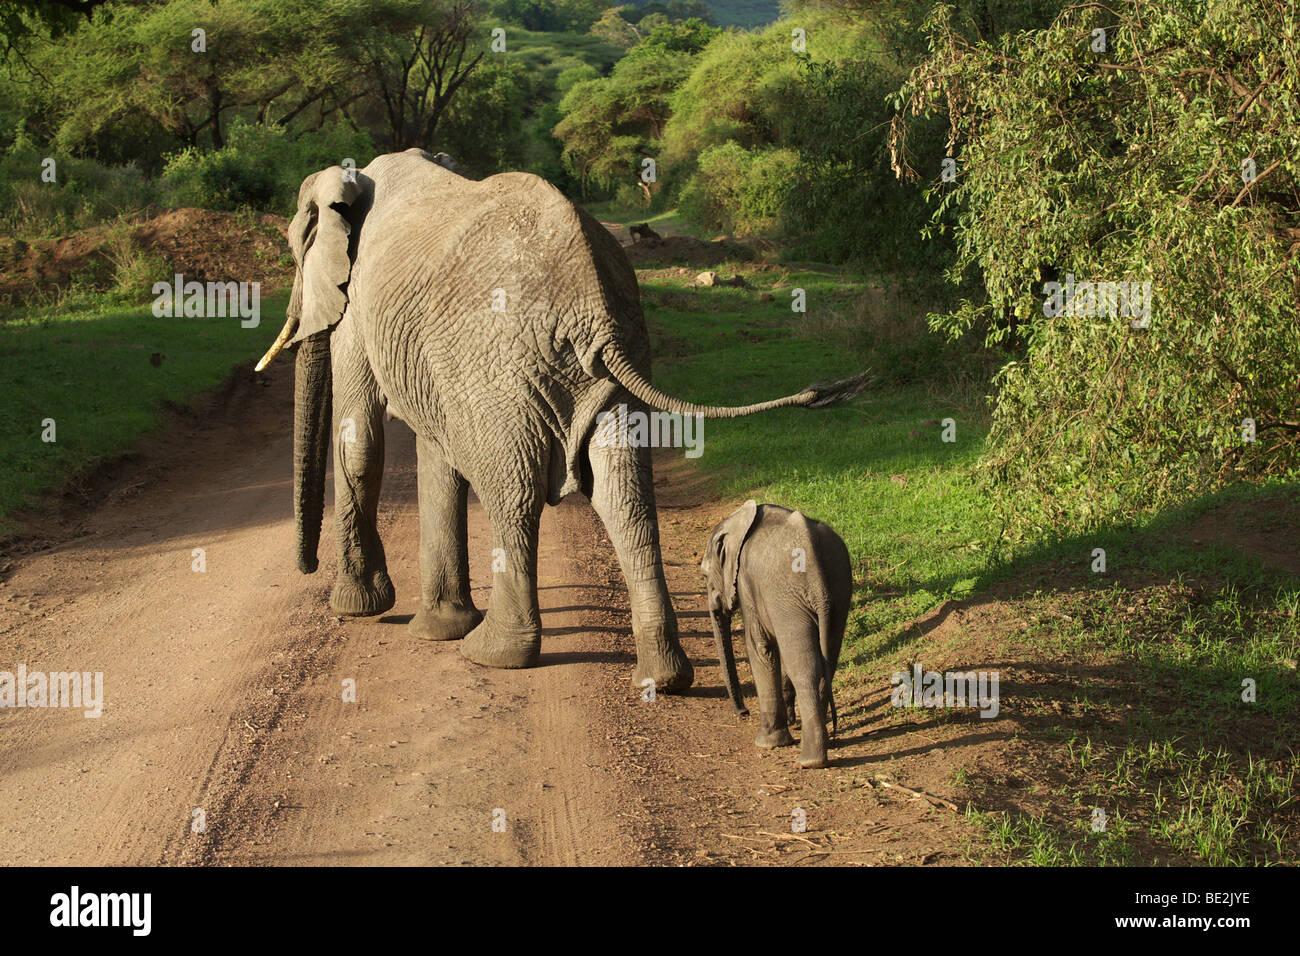 African Bush Elephant (Loxodonta africana), Lake Manyara National Park, Tanzania, Africa - Stock Image